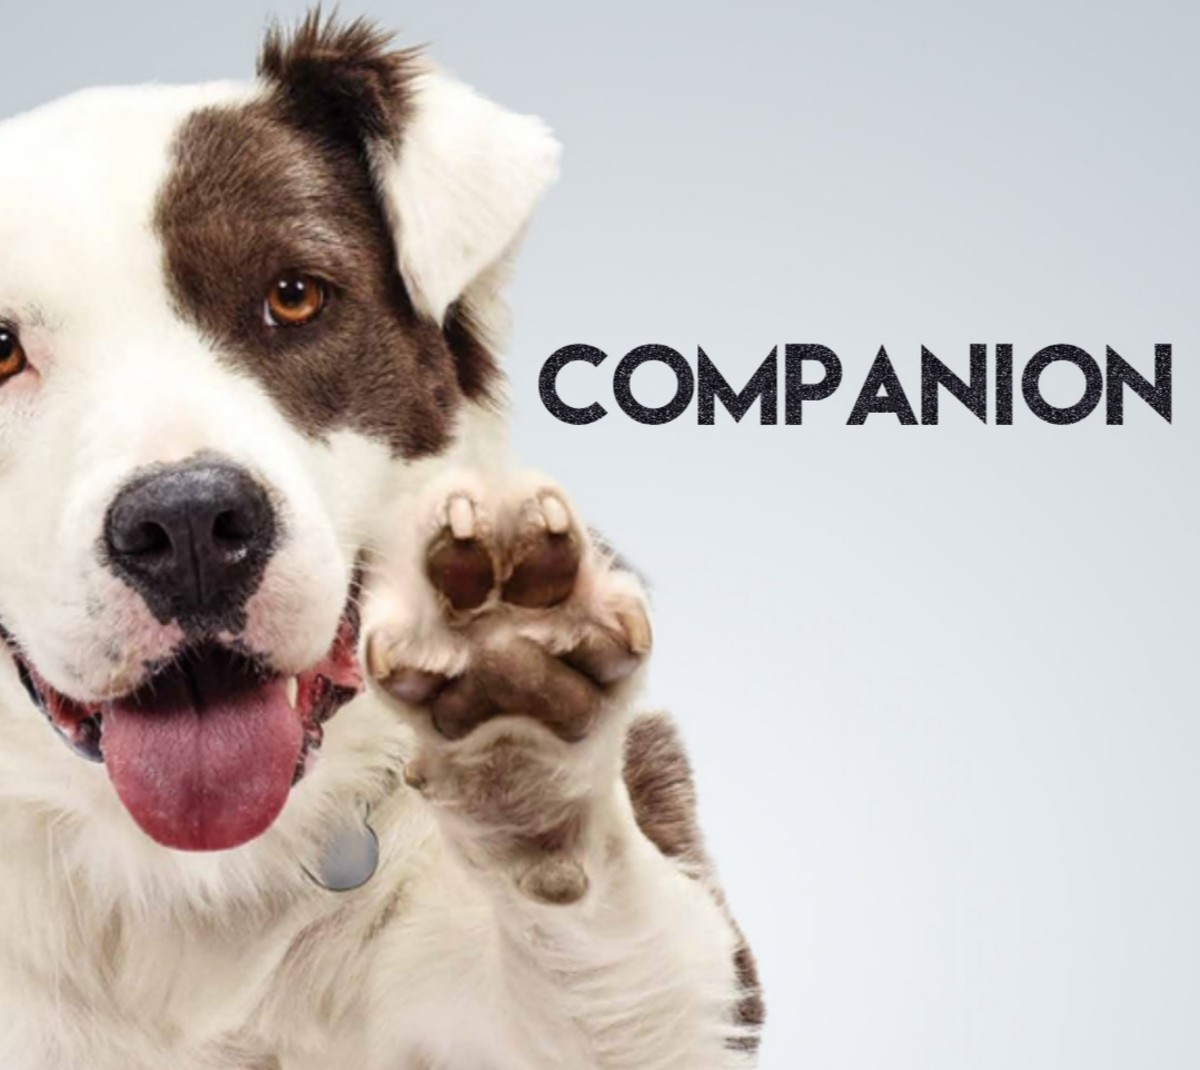 companion-a-narrative-poem